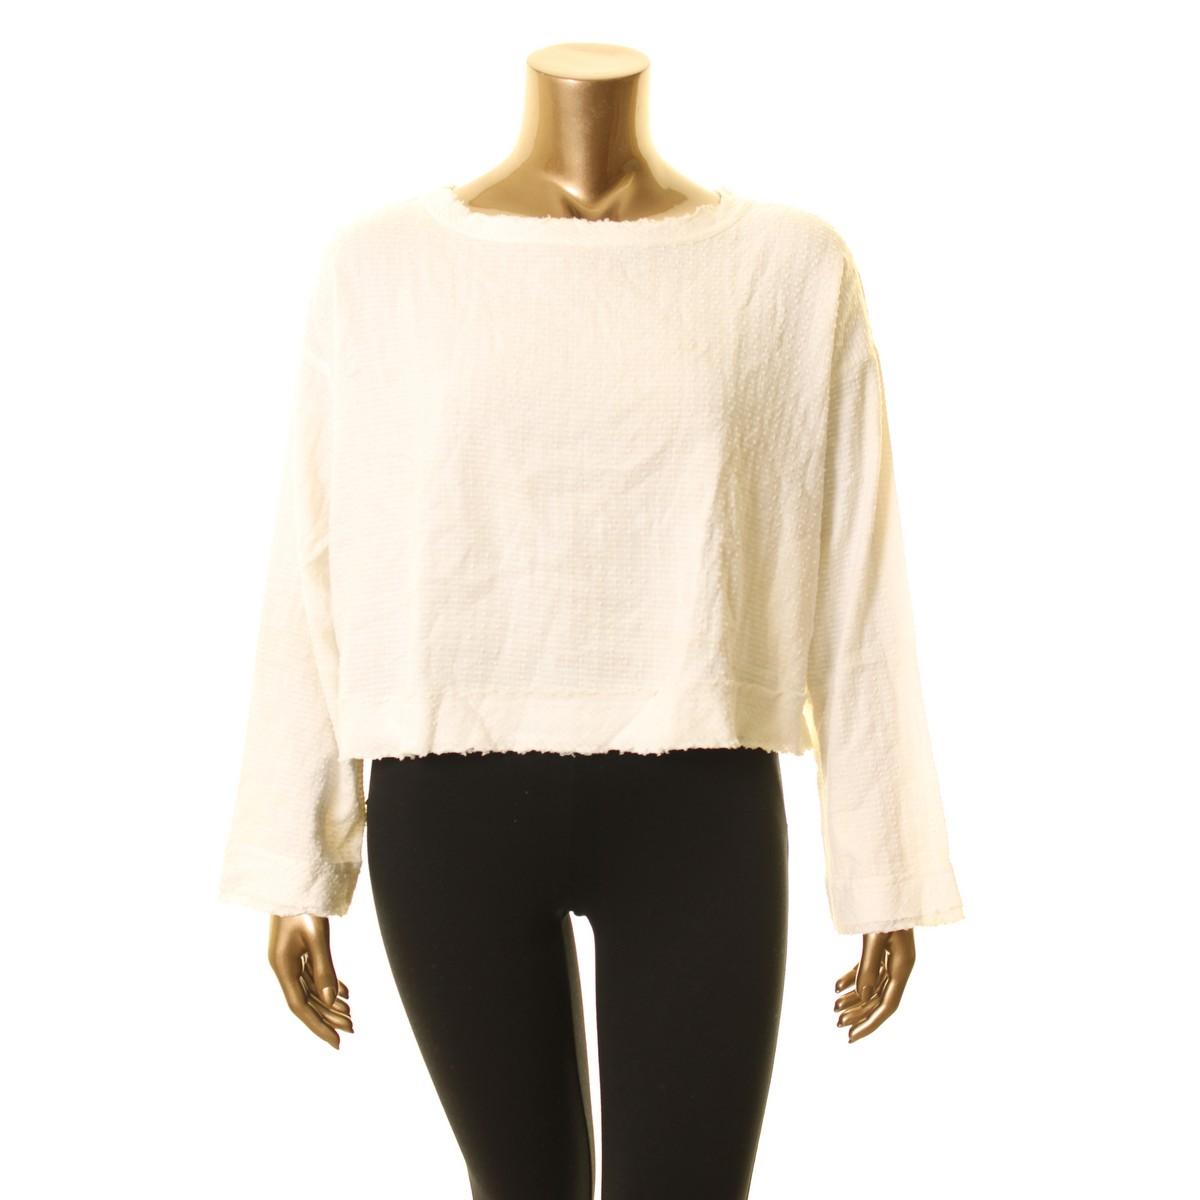 ALFANI NEW Women/'s Textured High-low Split-back Blouse Shirt Top TEDO